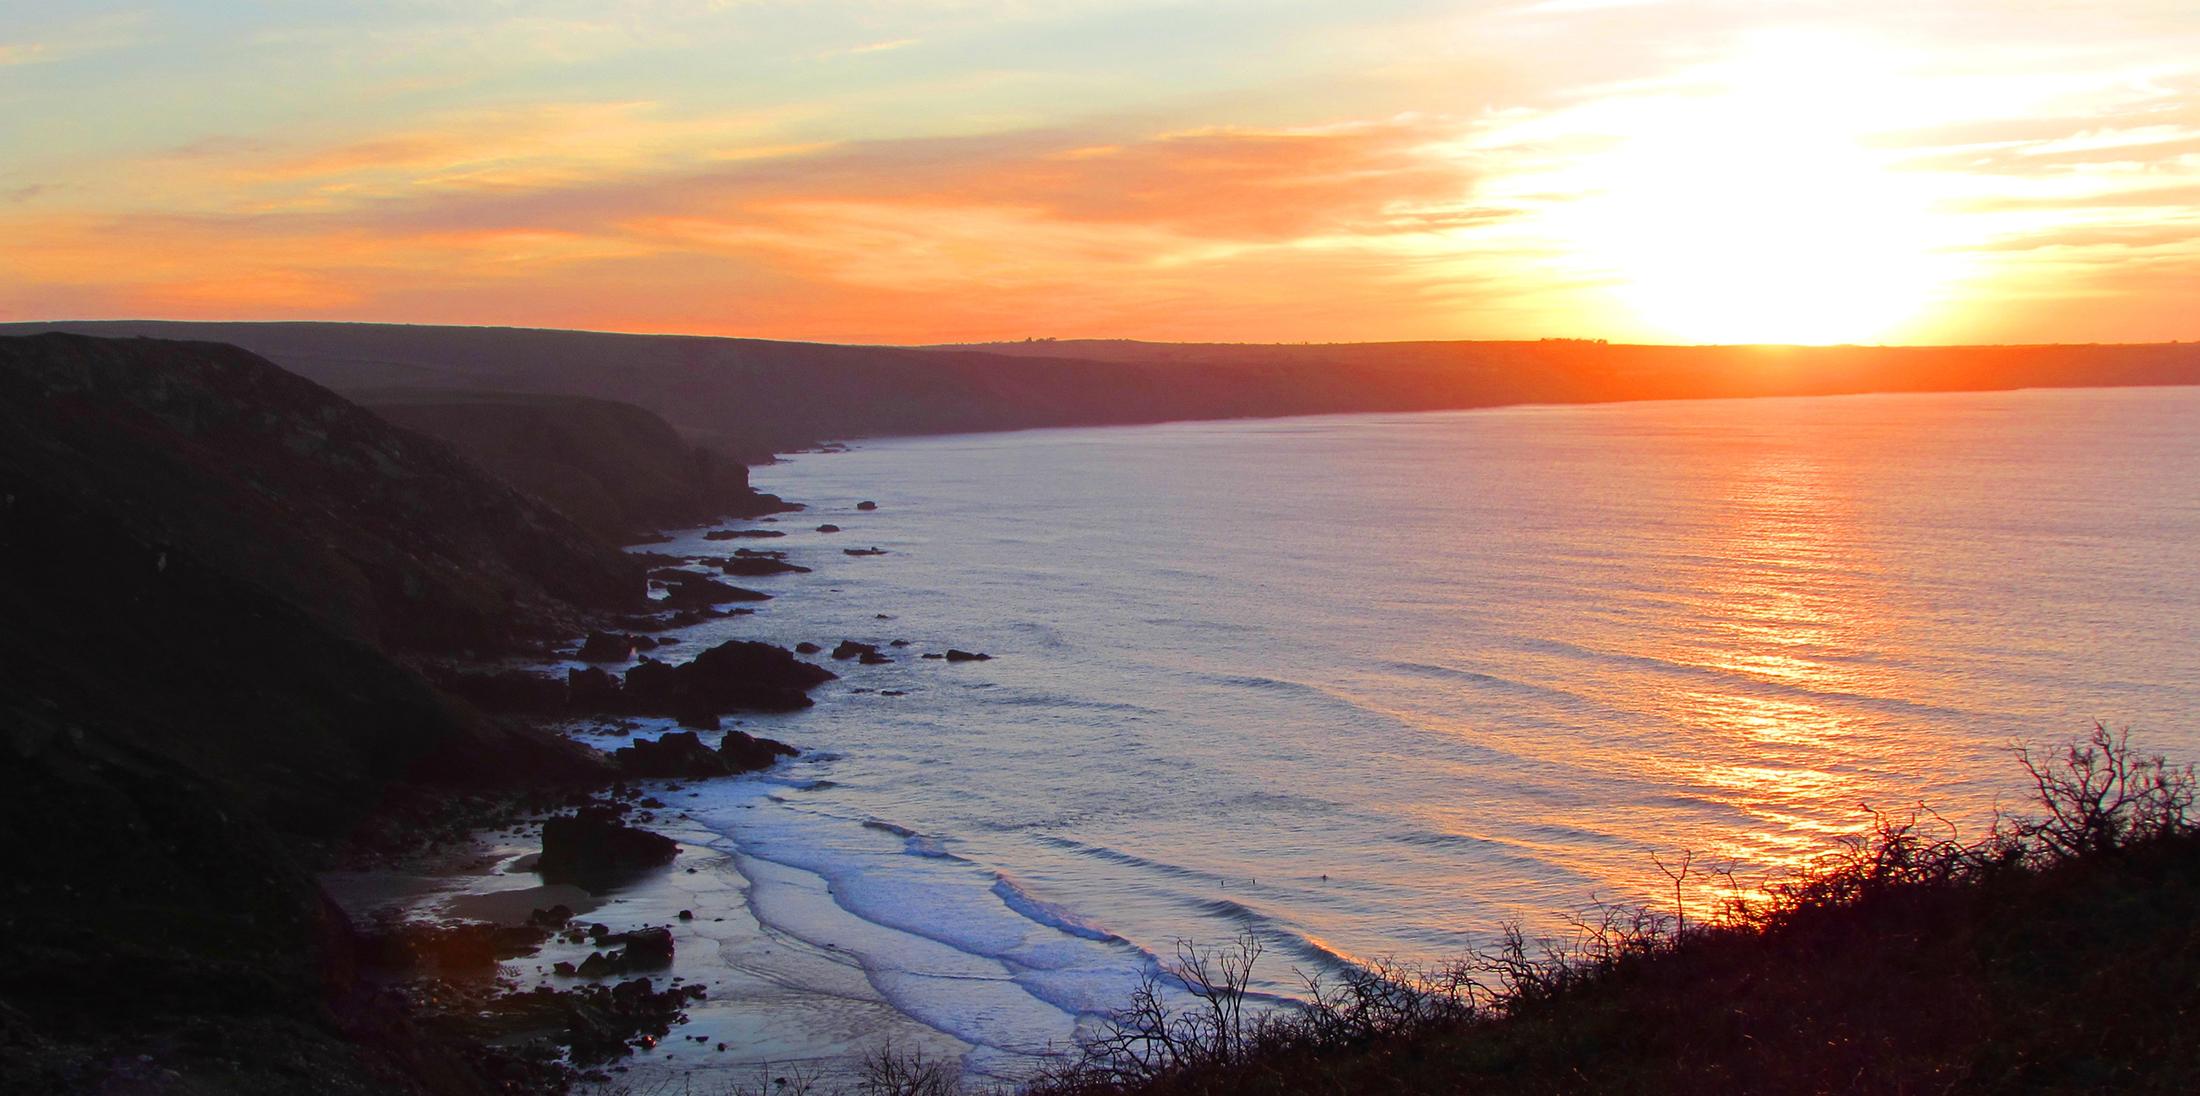 sunset over sea cornwall